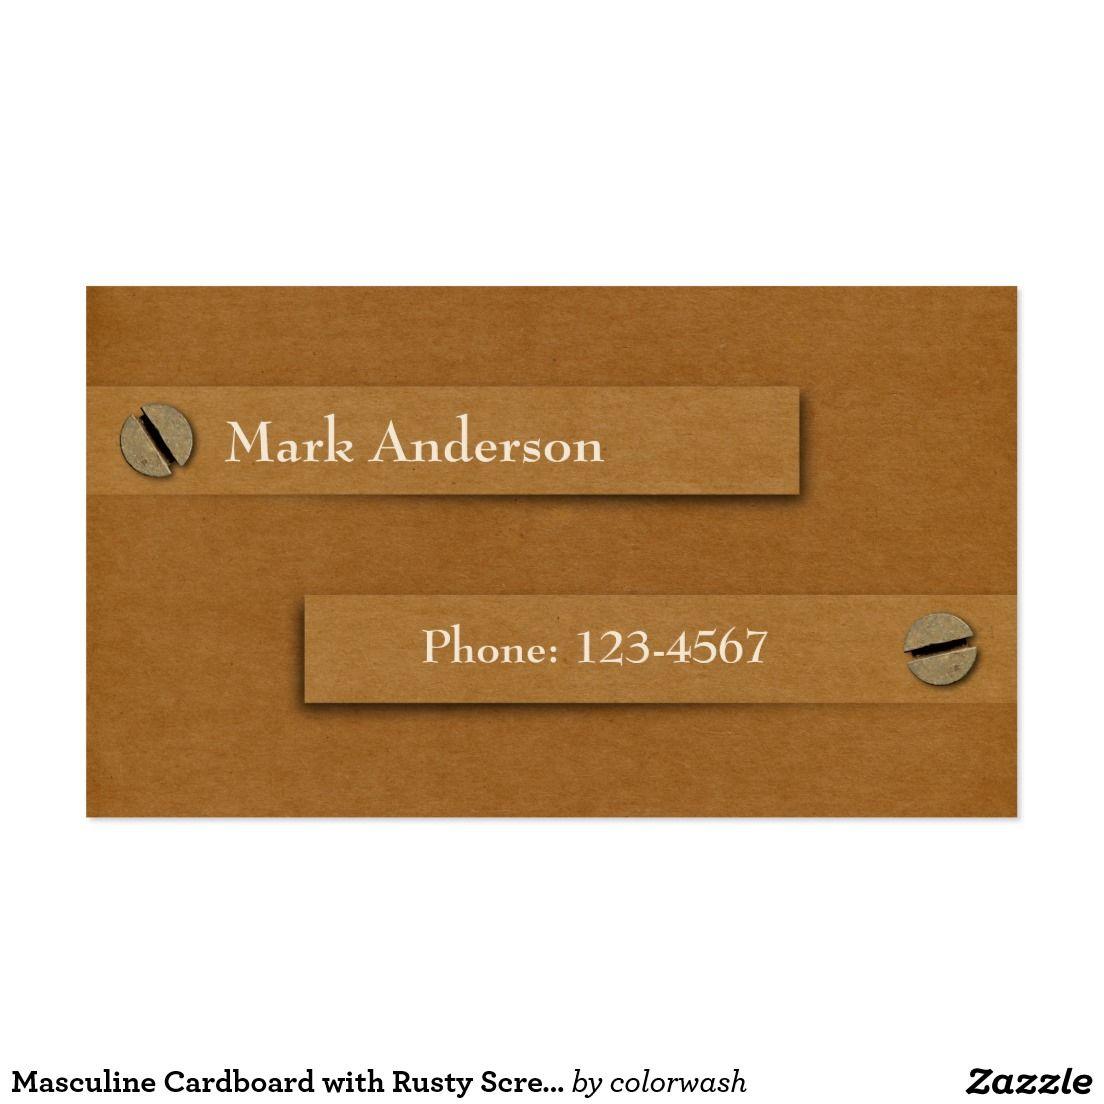 Masculine Cardboard with Rusty Screws Business Card